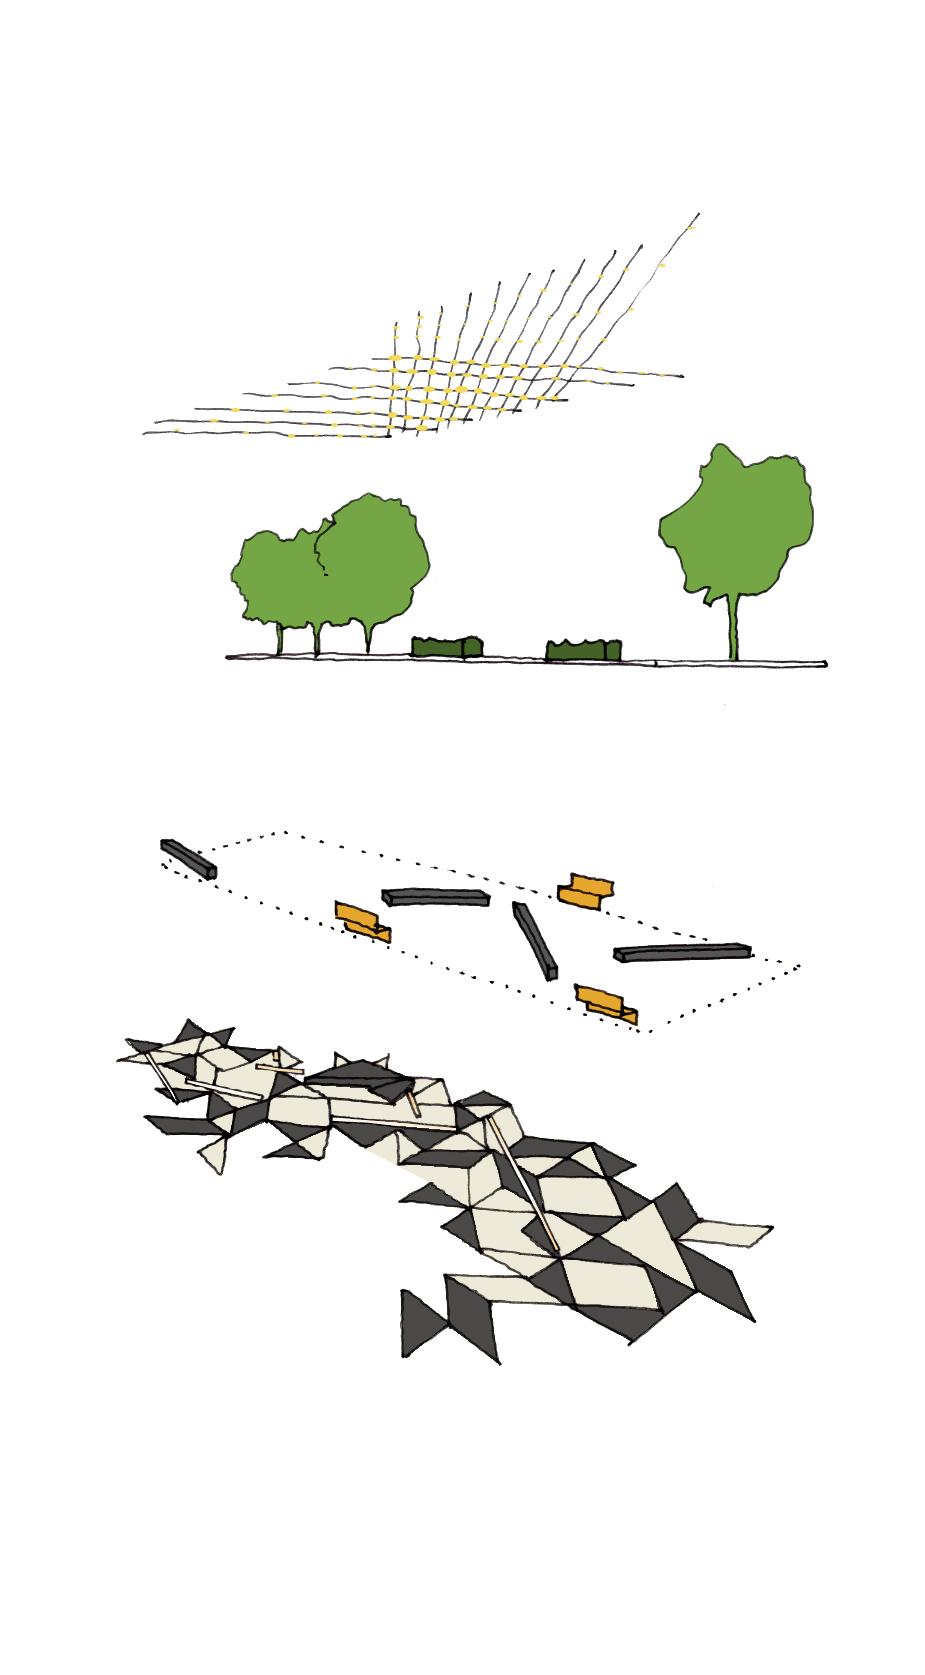 BA_pennine_drawing Urban Room_Hierarchy.jpg